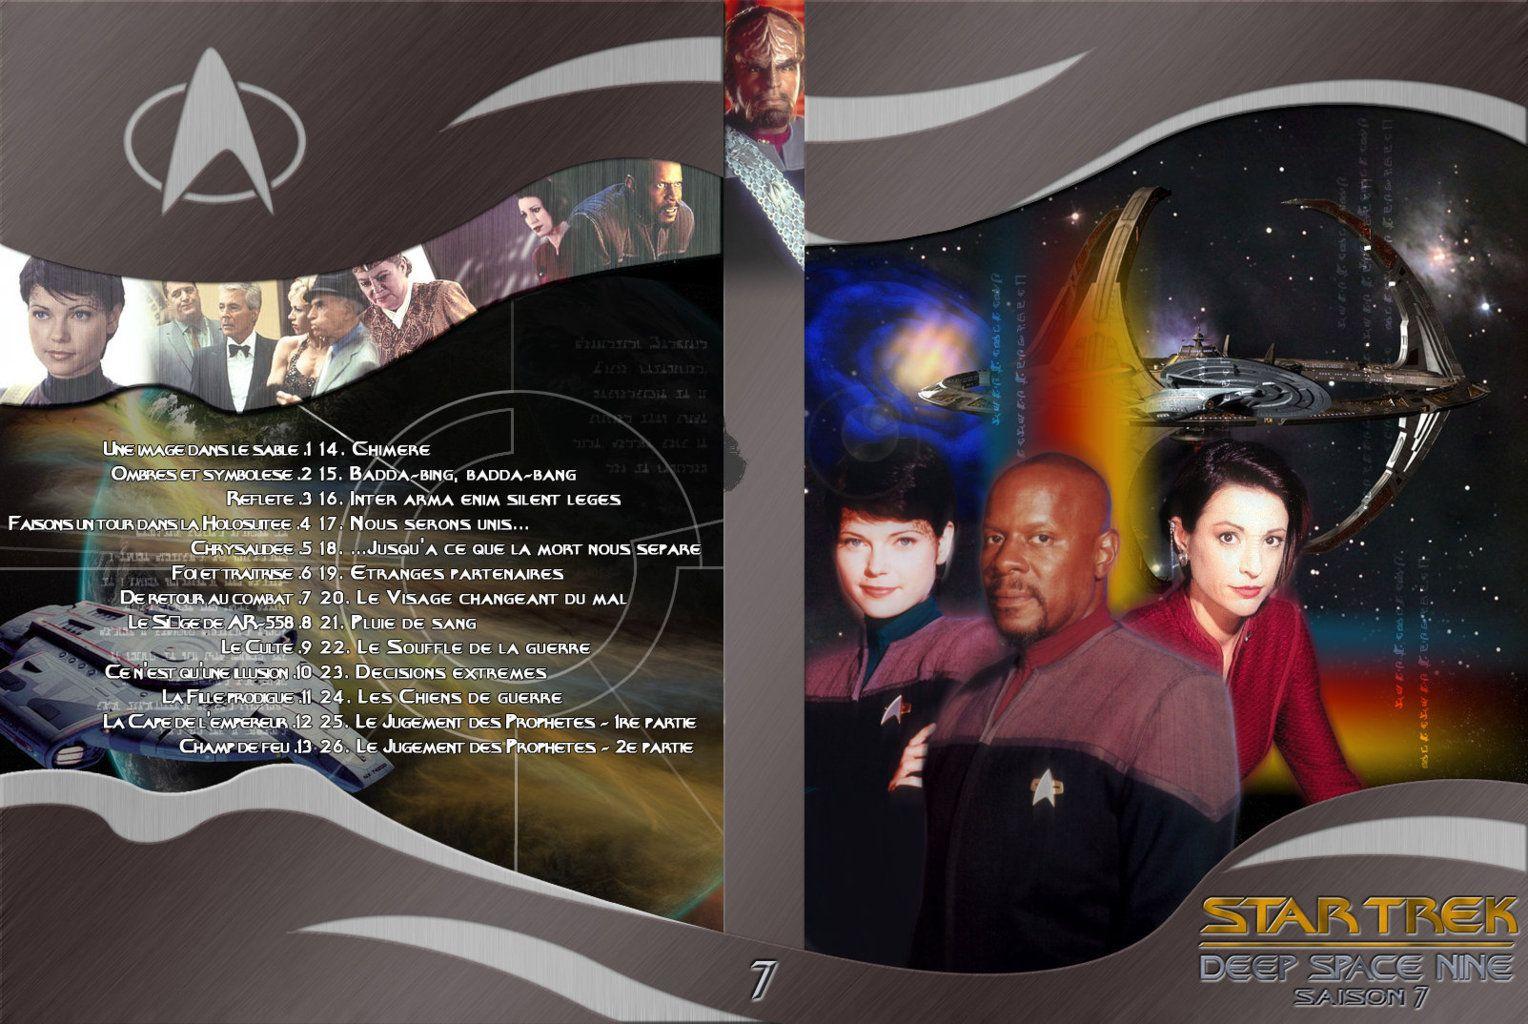 Star Trek Deep Space Nine - Saison 7